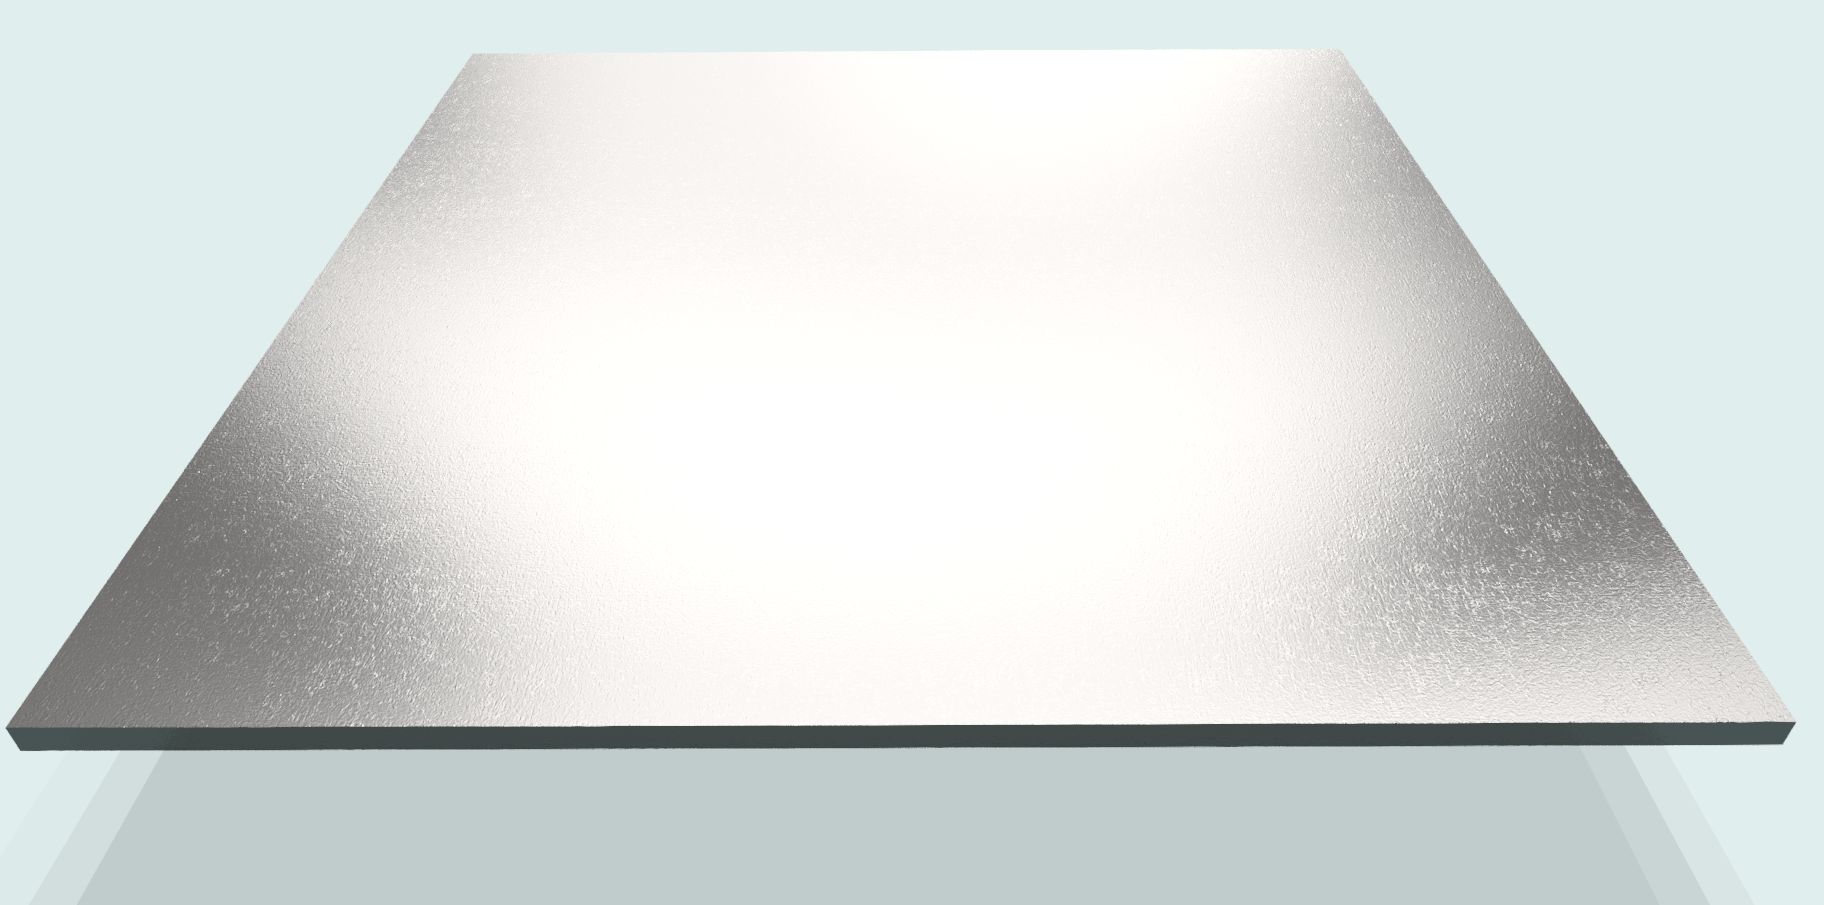 Blech 4 mm St, blank S235JR gebeizt+gefettet